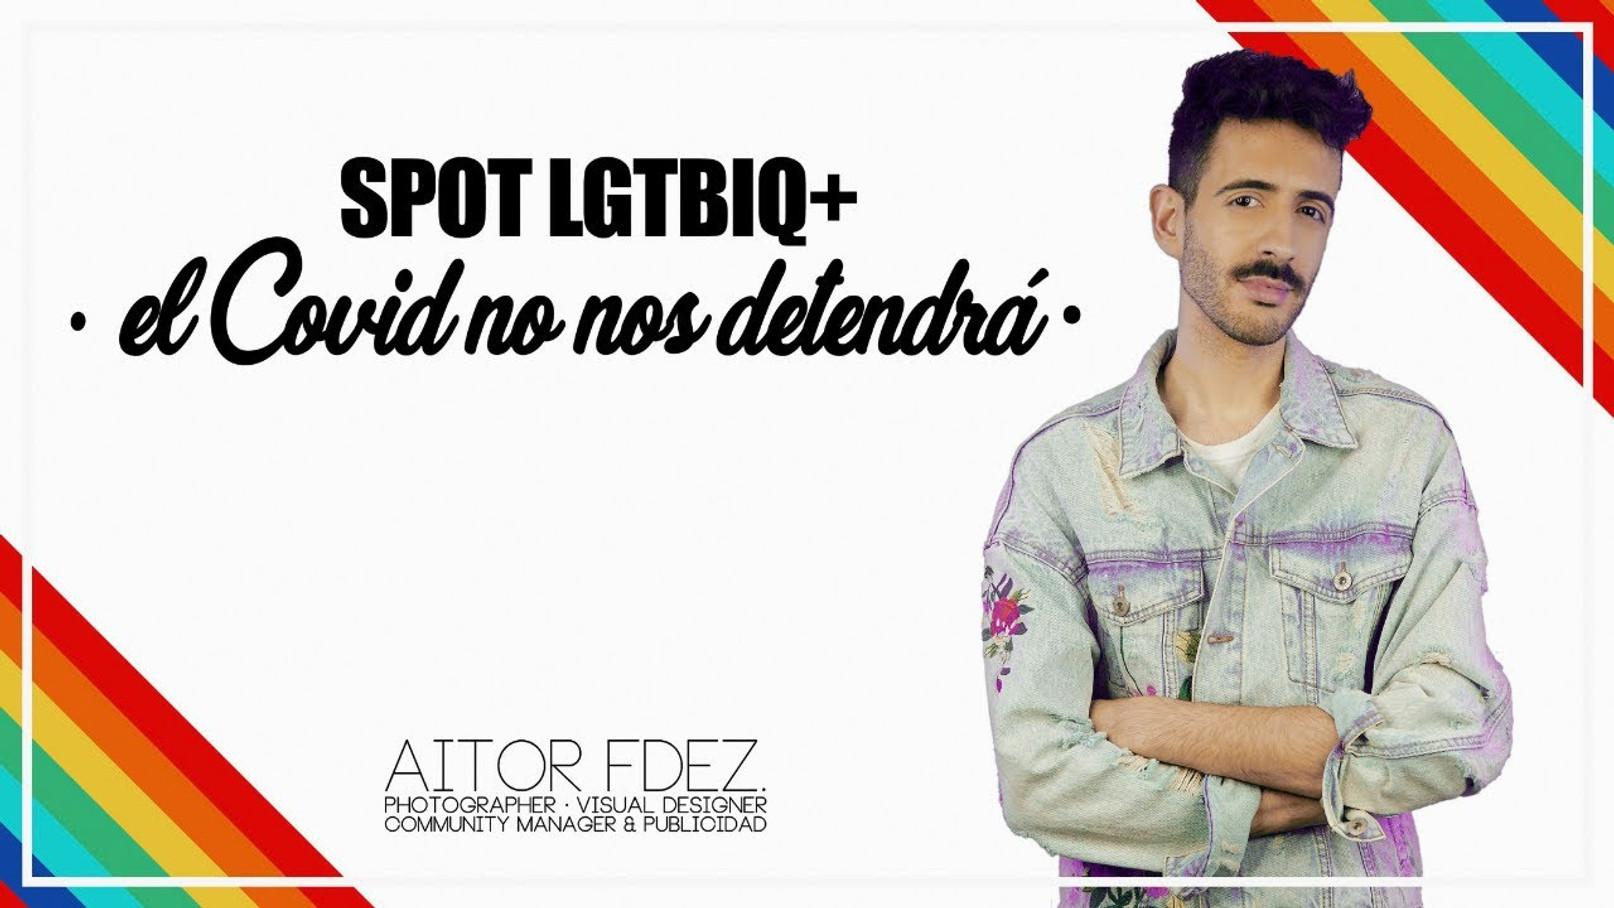 EL COVID NO NOS DETENDRÁ #Lgtbi #Orgullo2020